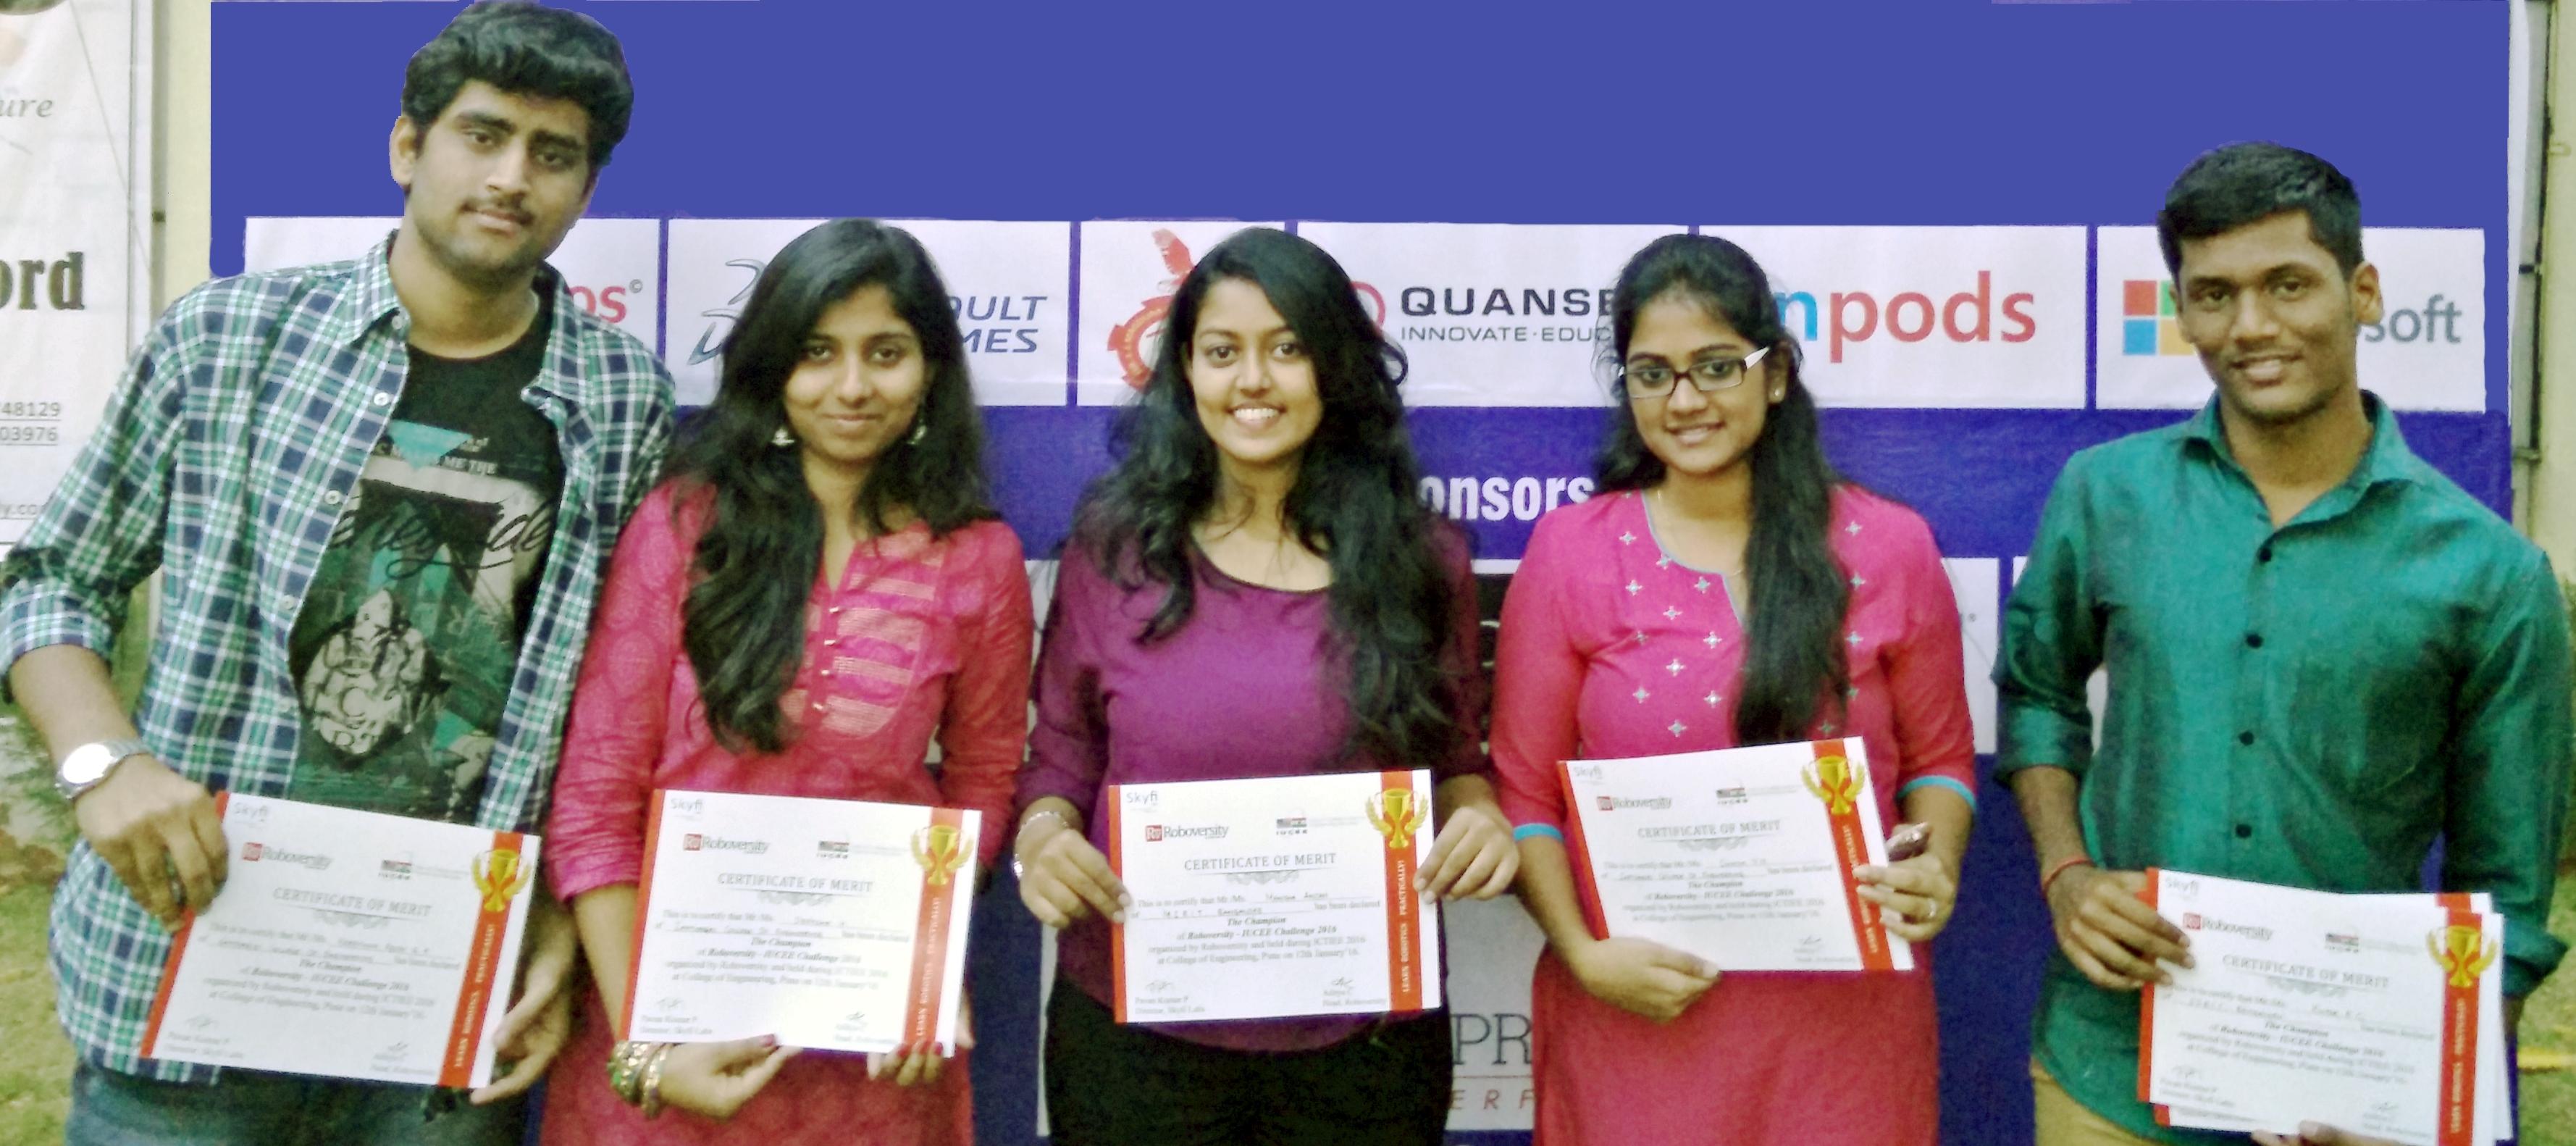 Roboversity IUCEE Challenge 2016 Winners